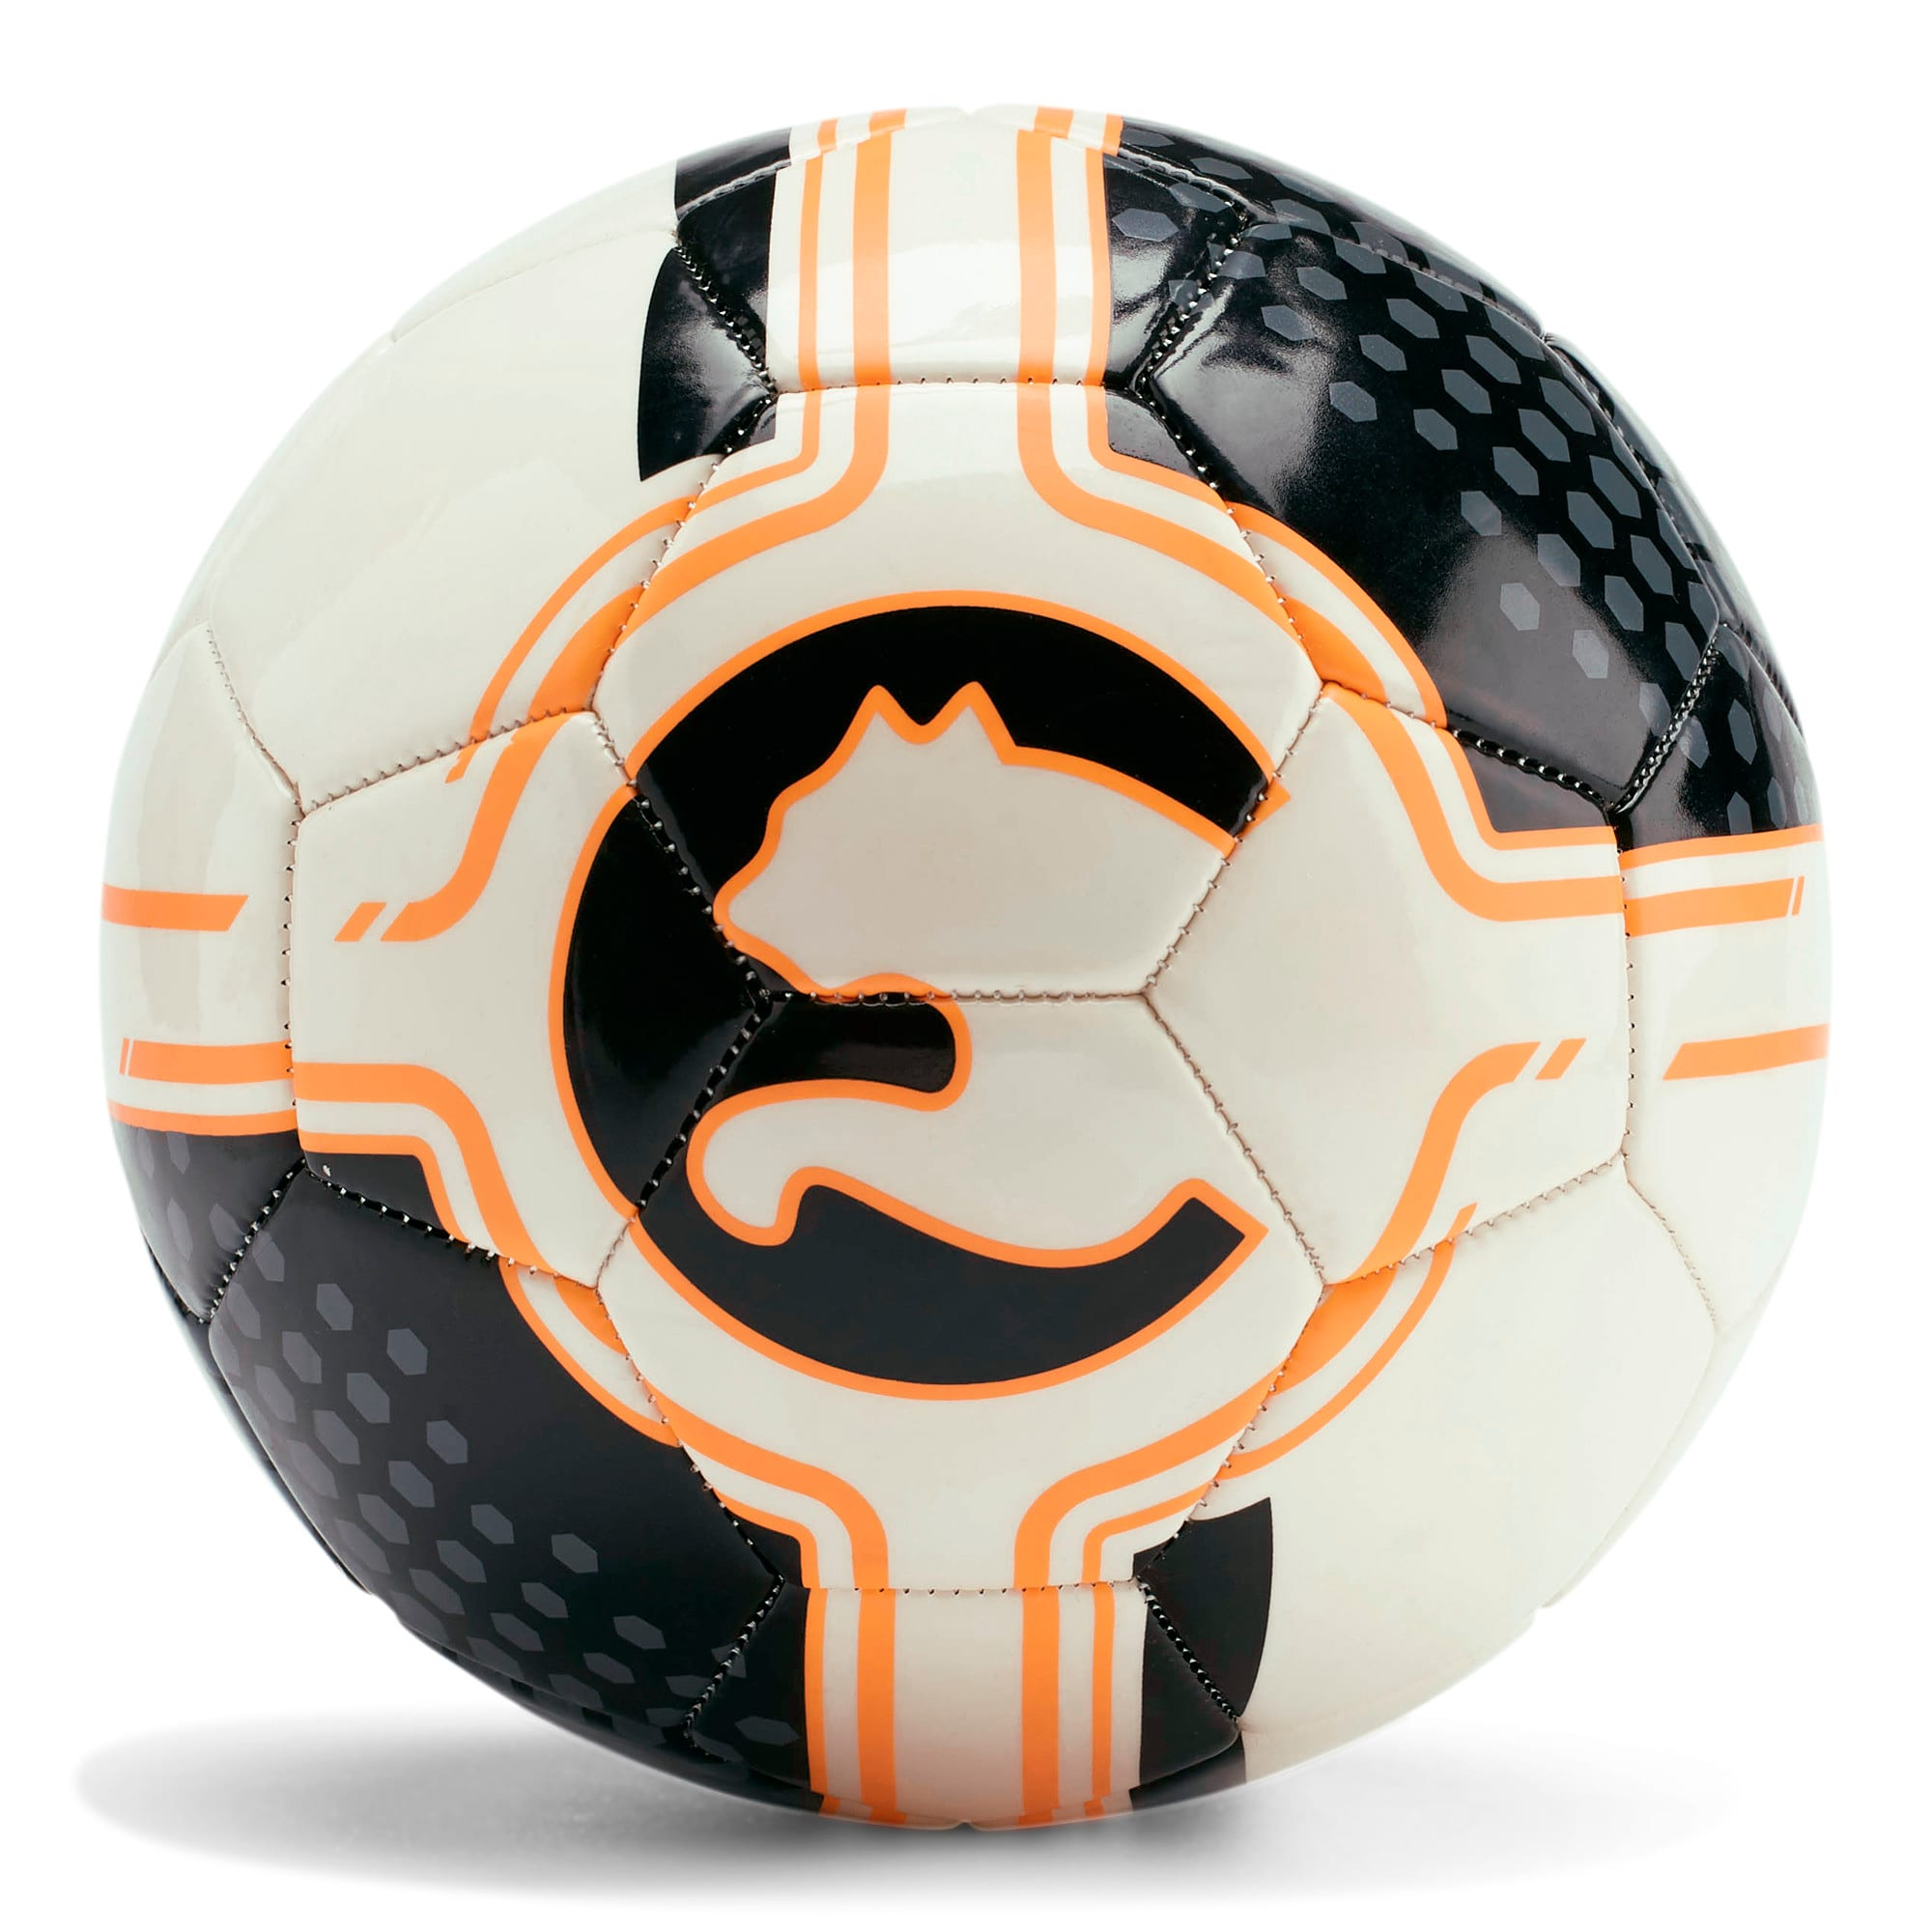 Thumbnail 1 of ProCat Scoreline 2.0 Soccer Ball, ORANGE, medium